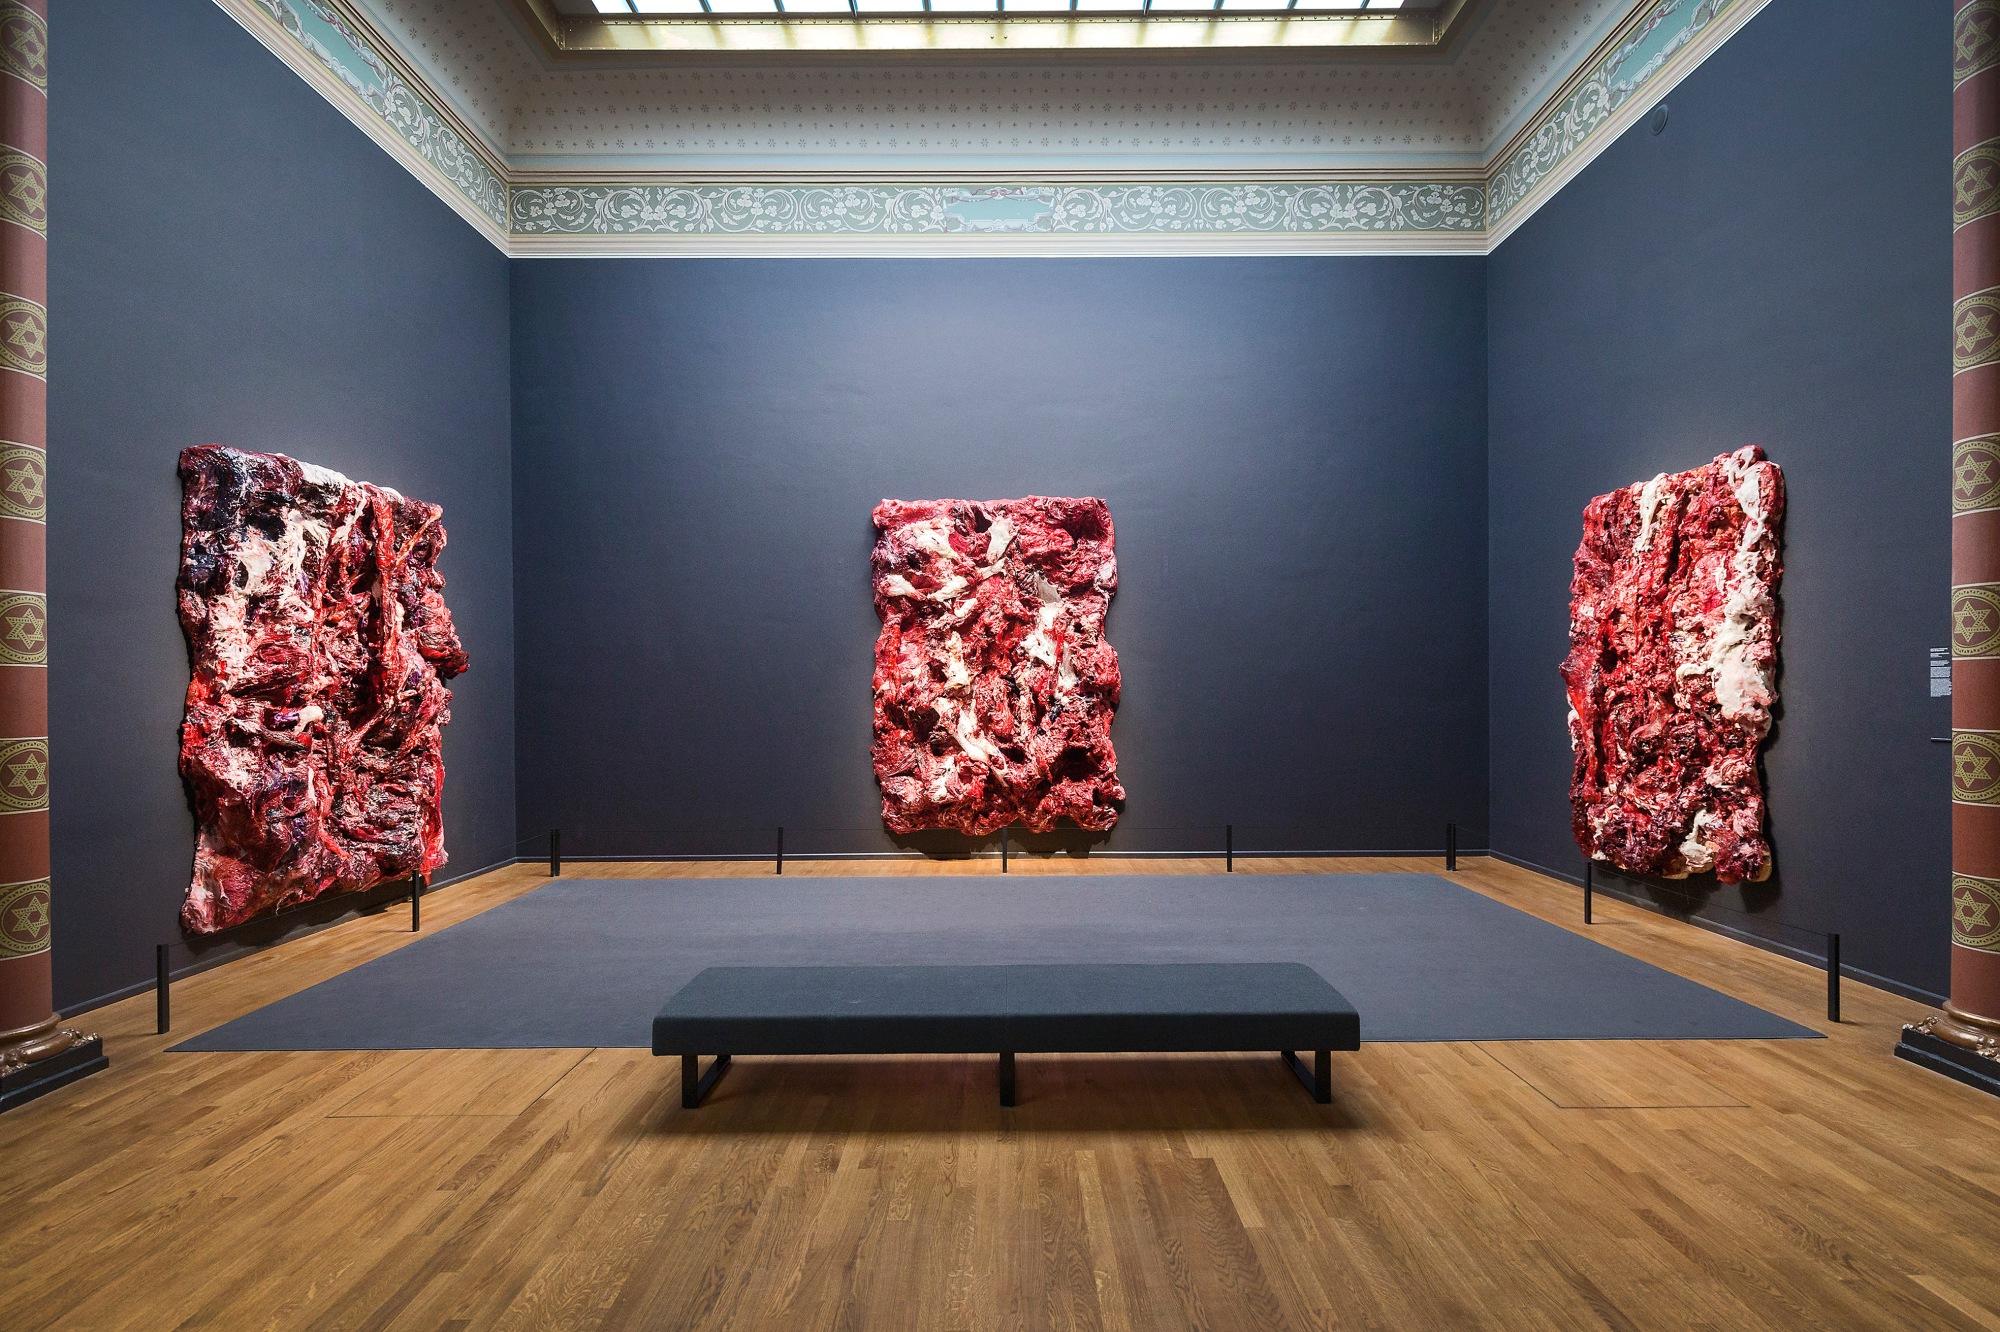 Anish Kapoor, Inneres Objekt in drei Teilen, 2013-2015. Silikon und Farbstoff, je 293 x 218 x 40 cm. Rijksmuseum, Amsterdam.